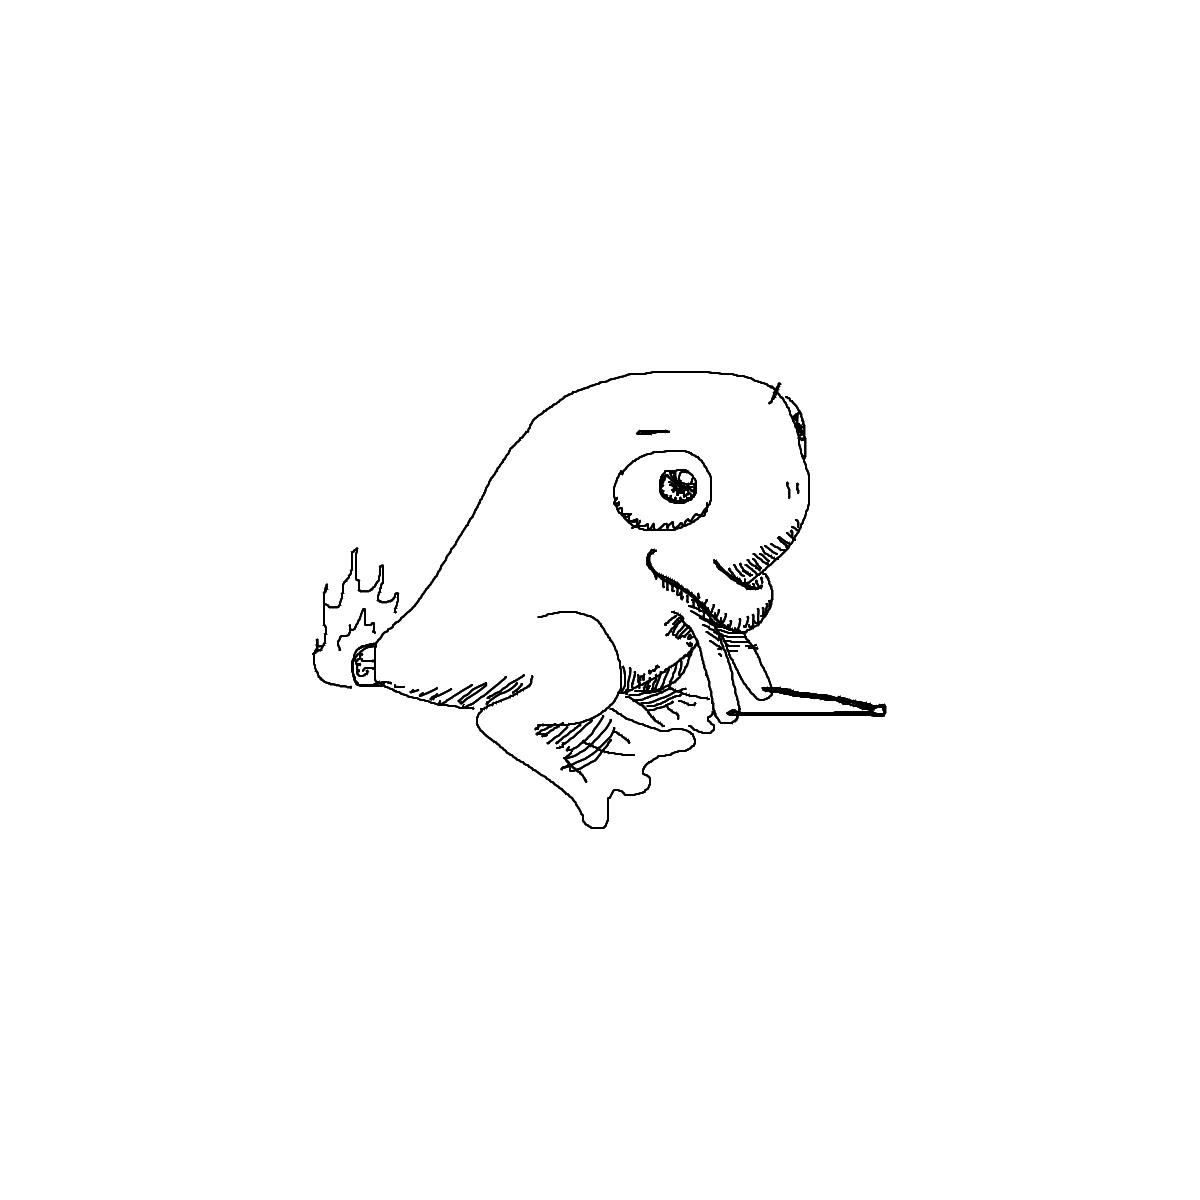 BAAAM drawing#5127 lat:78.7413253784179700lng: -18.1151618957519530